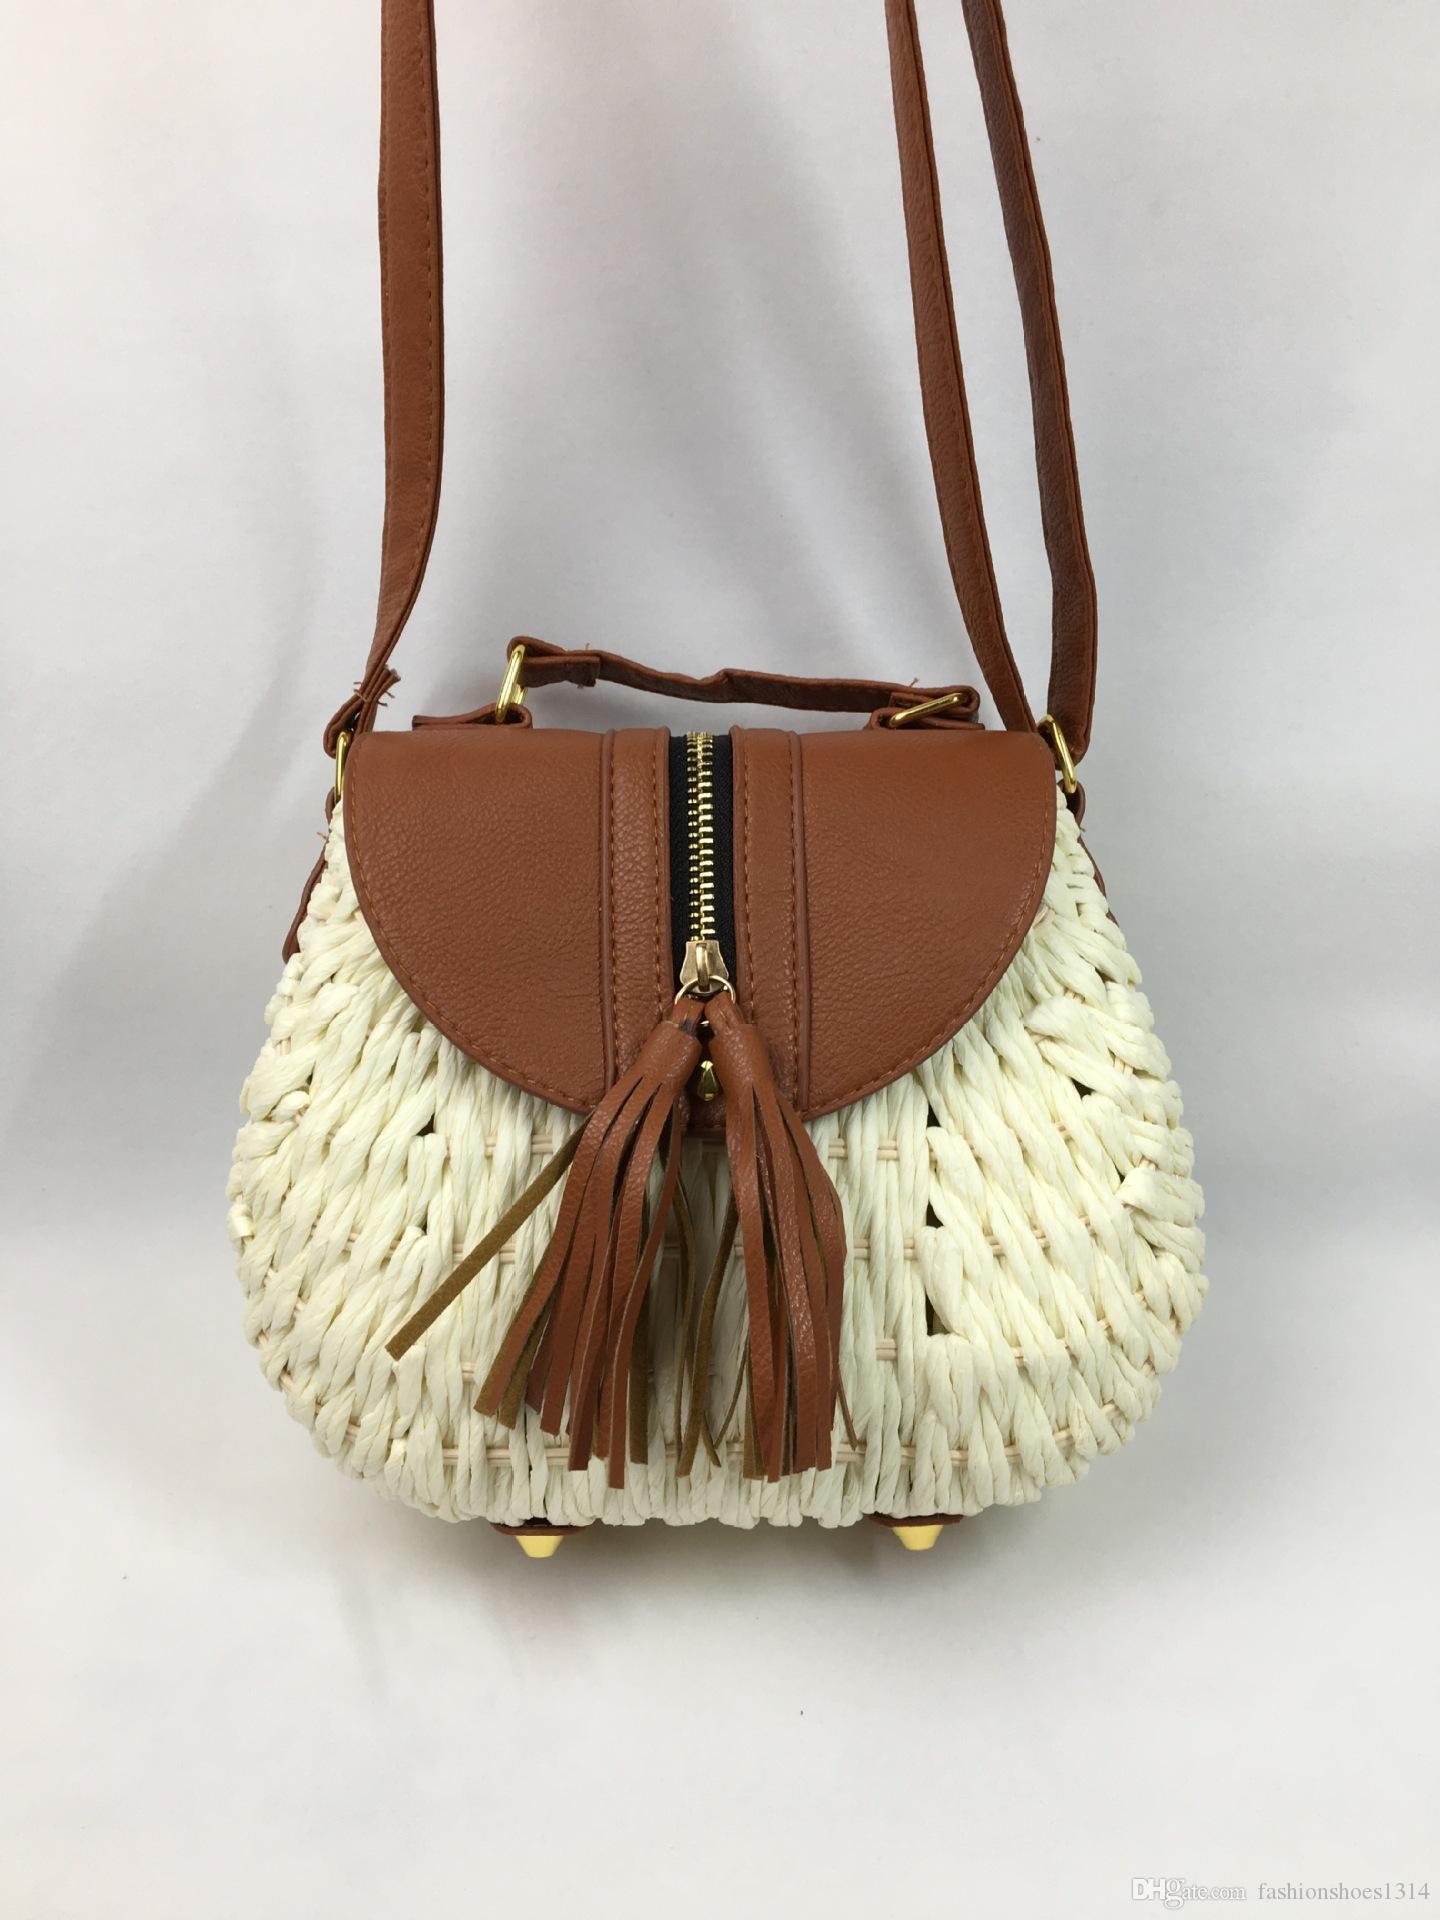 2019 New Summer Fashion Rattan Woven Straw Beach Bags Handbags Women Fringe Tassel Crossbody Messenger Bags Female Casual Small Shoulder Bag